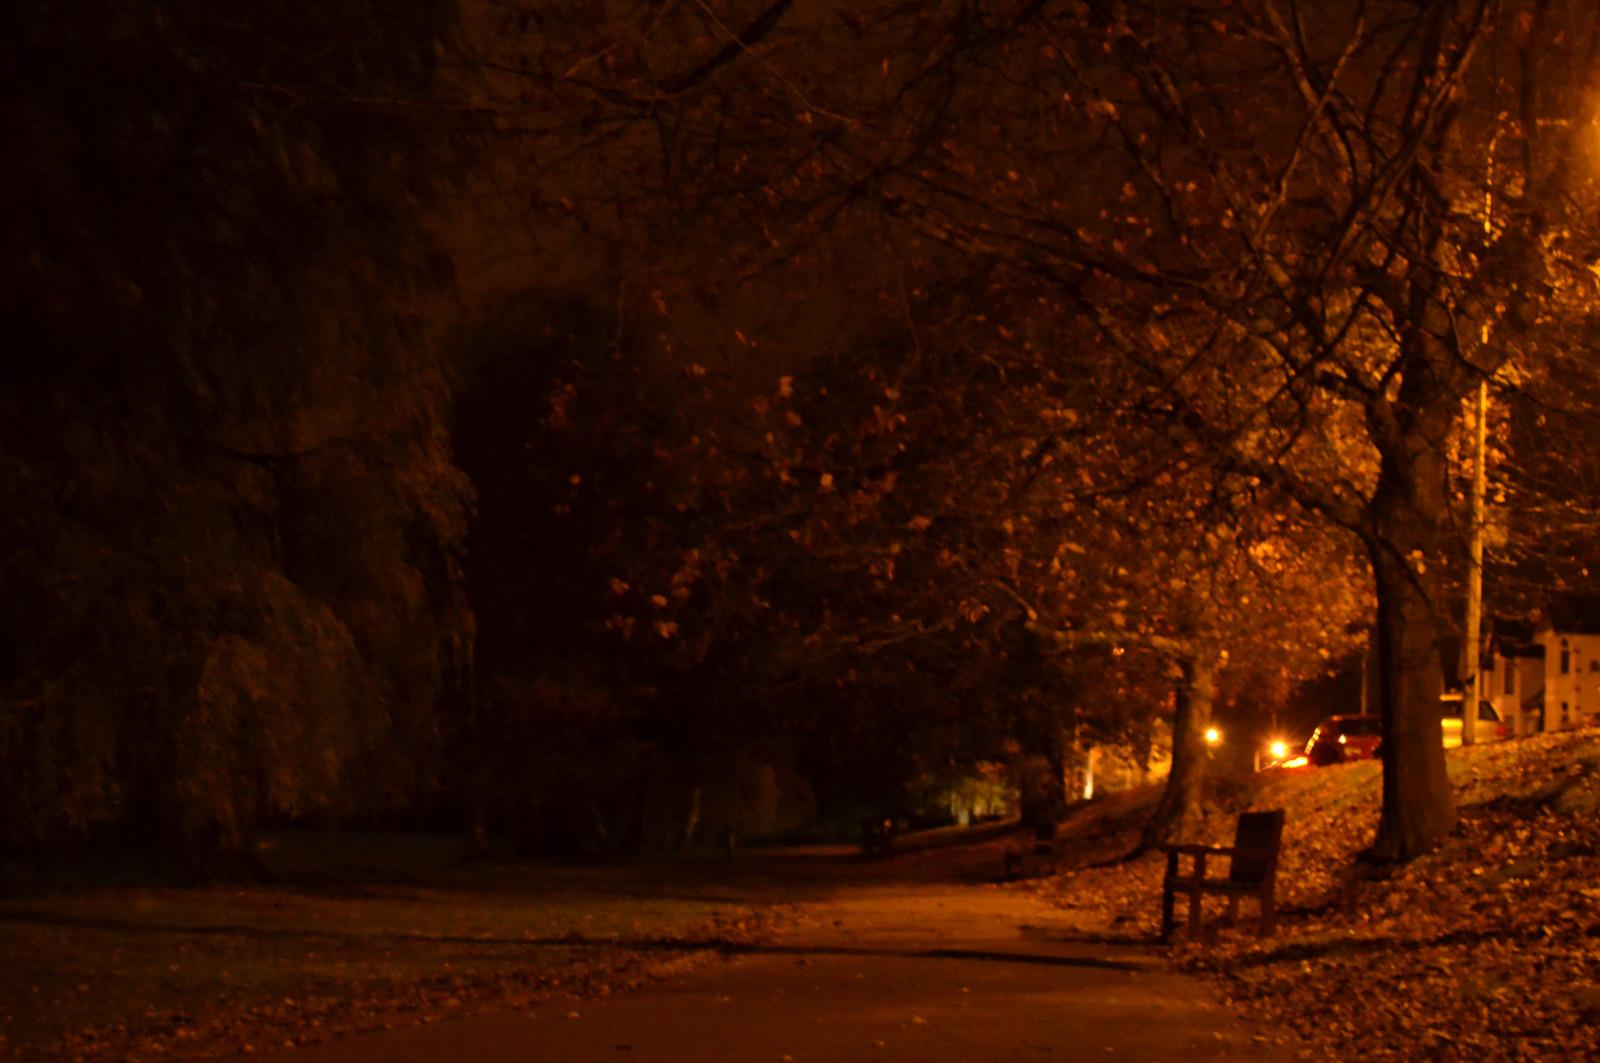 Fall Forest Hd Wallpaper Wallpaper Sunlight Trees Forest Leaves Dark Night